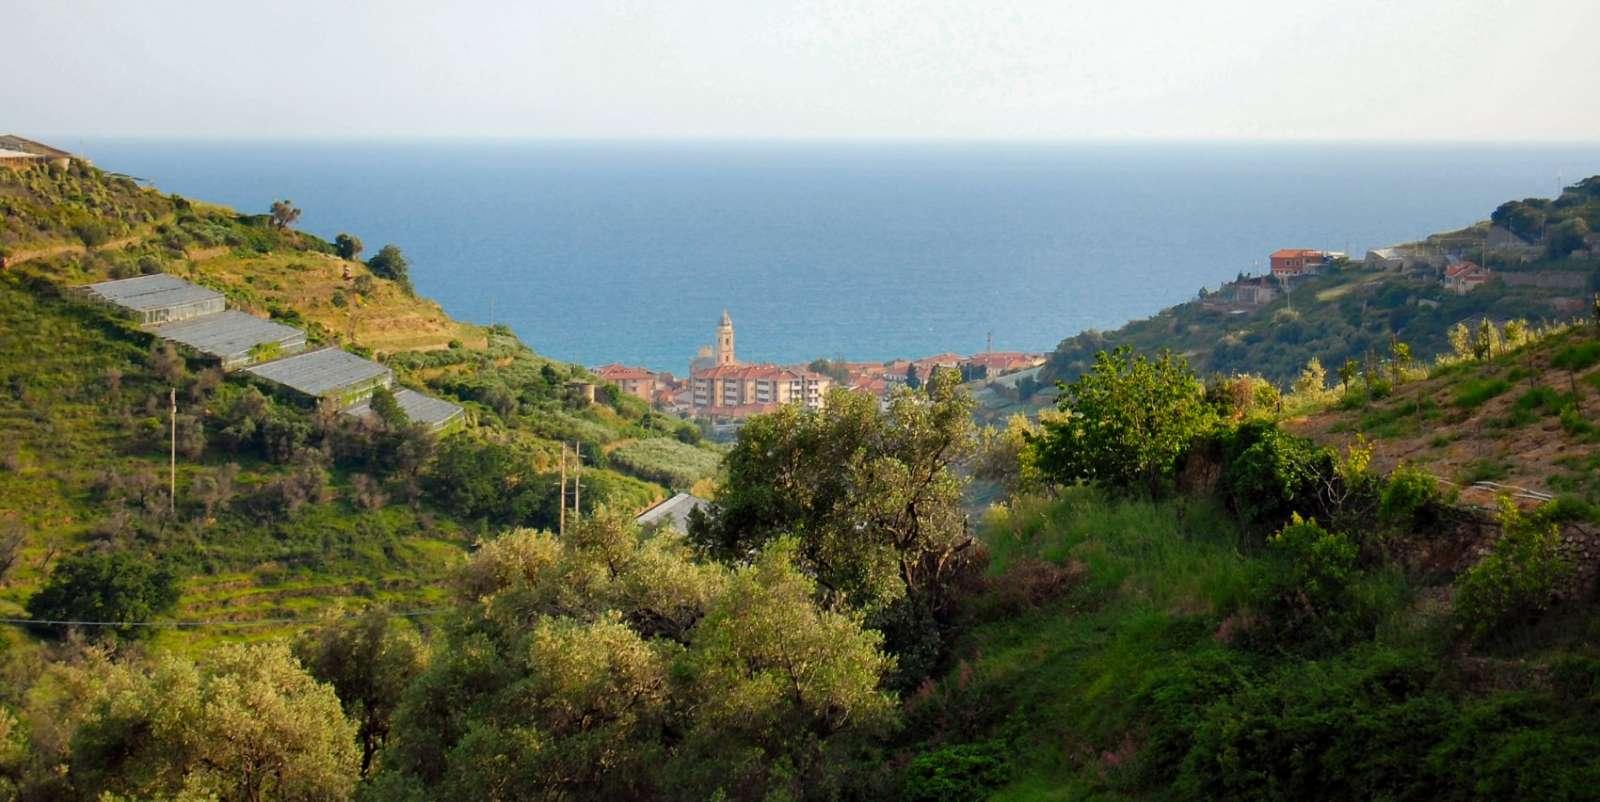 Blick hinunter in Richtung Meer und Riva Ligure